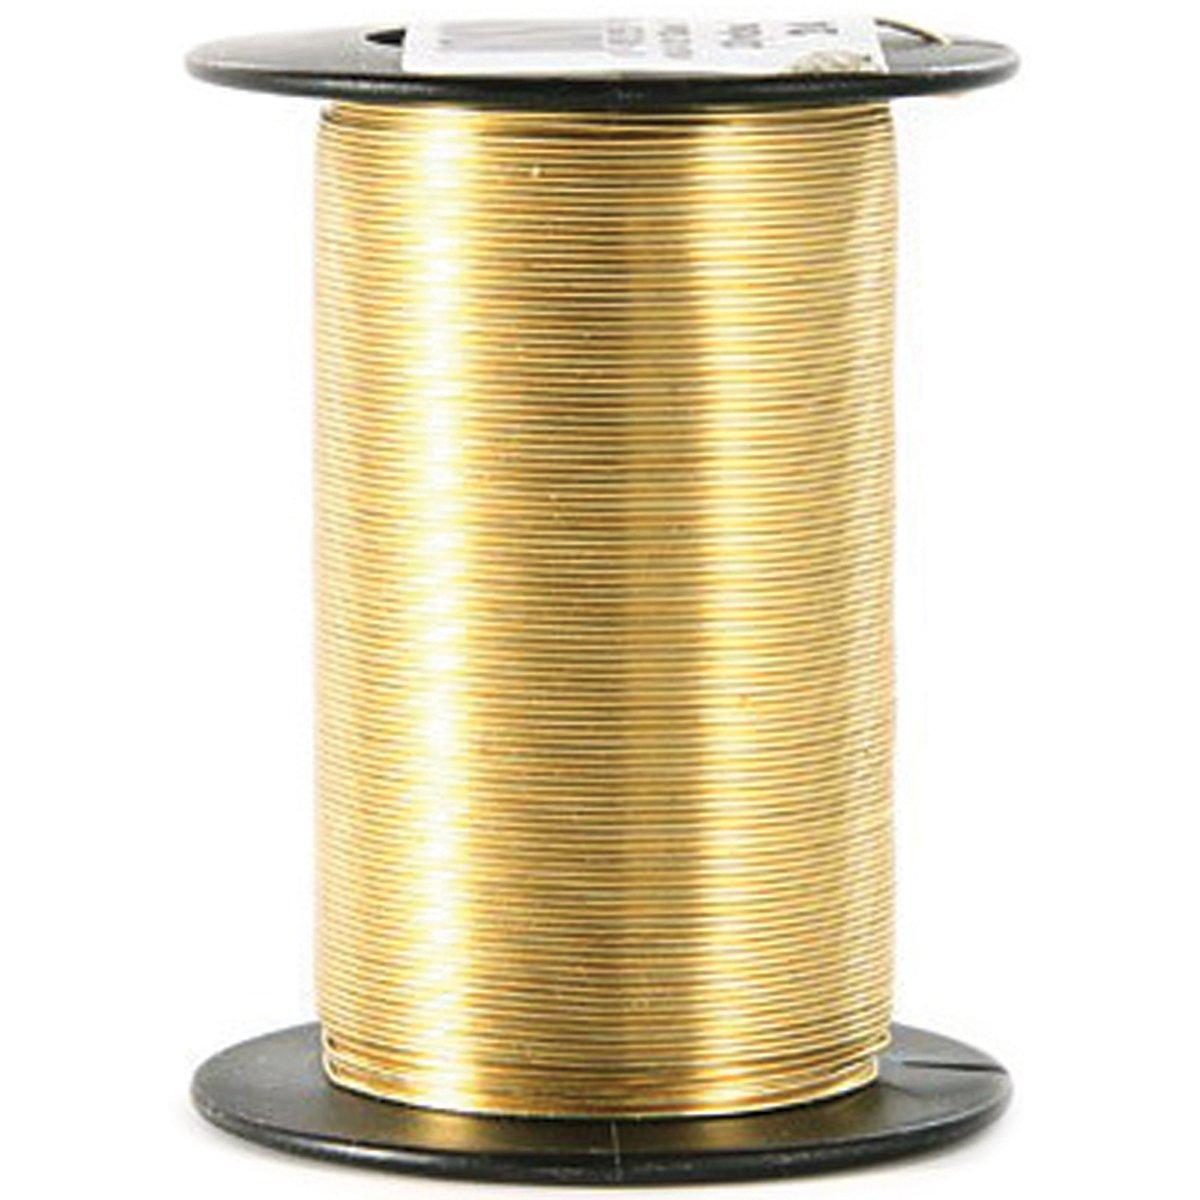 Beadery 24 Gauge Wire 25 Yards/Pkg-Gold 2490212